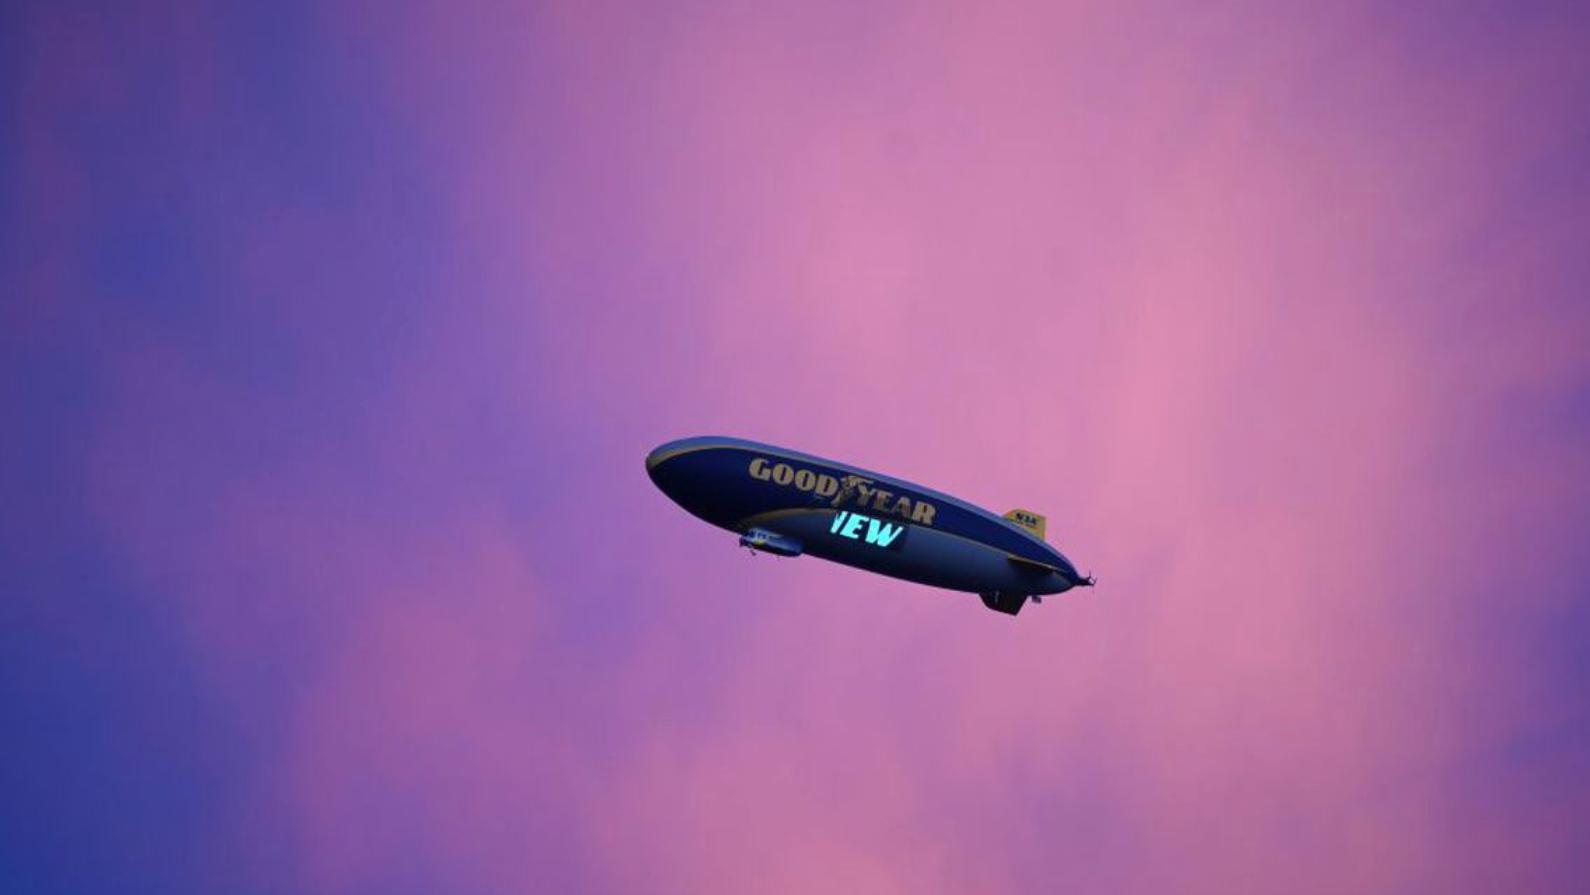 Goodyear blimp mistaken for alien spacecraft